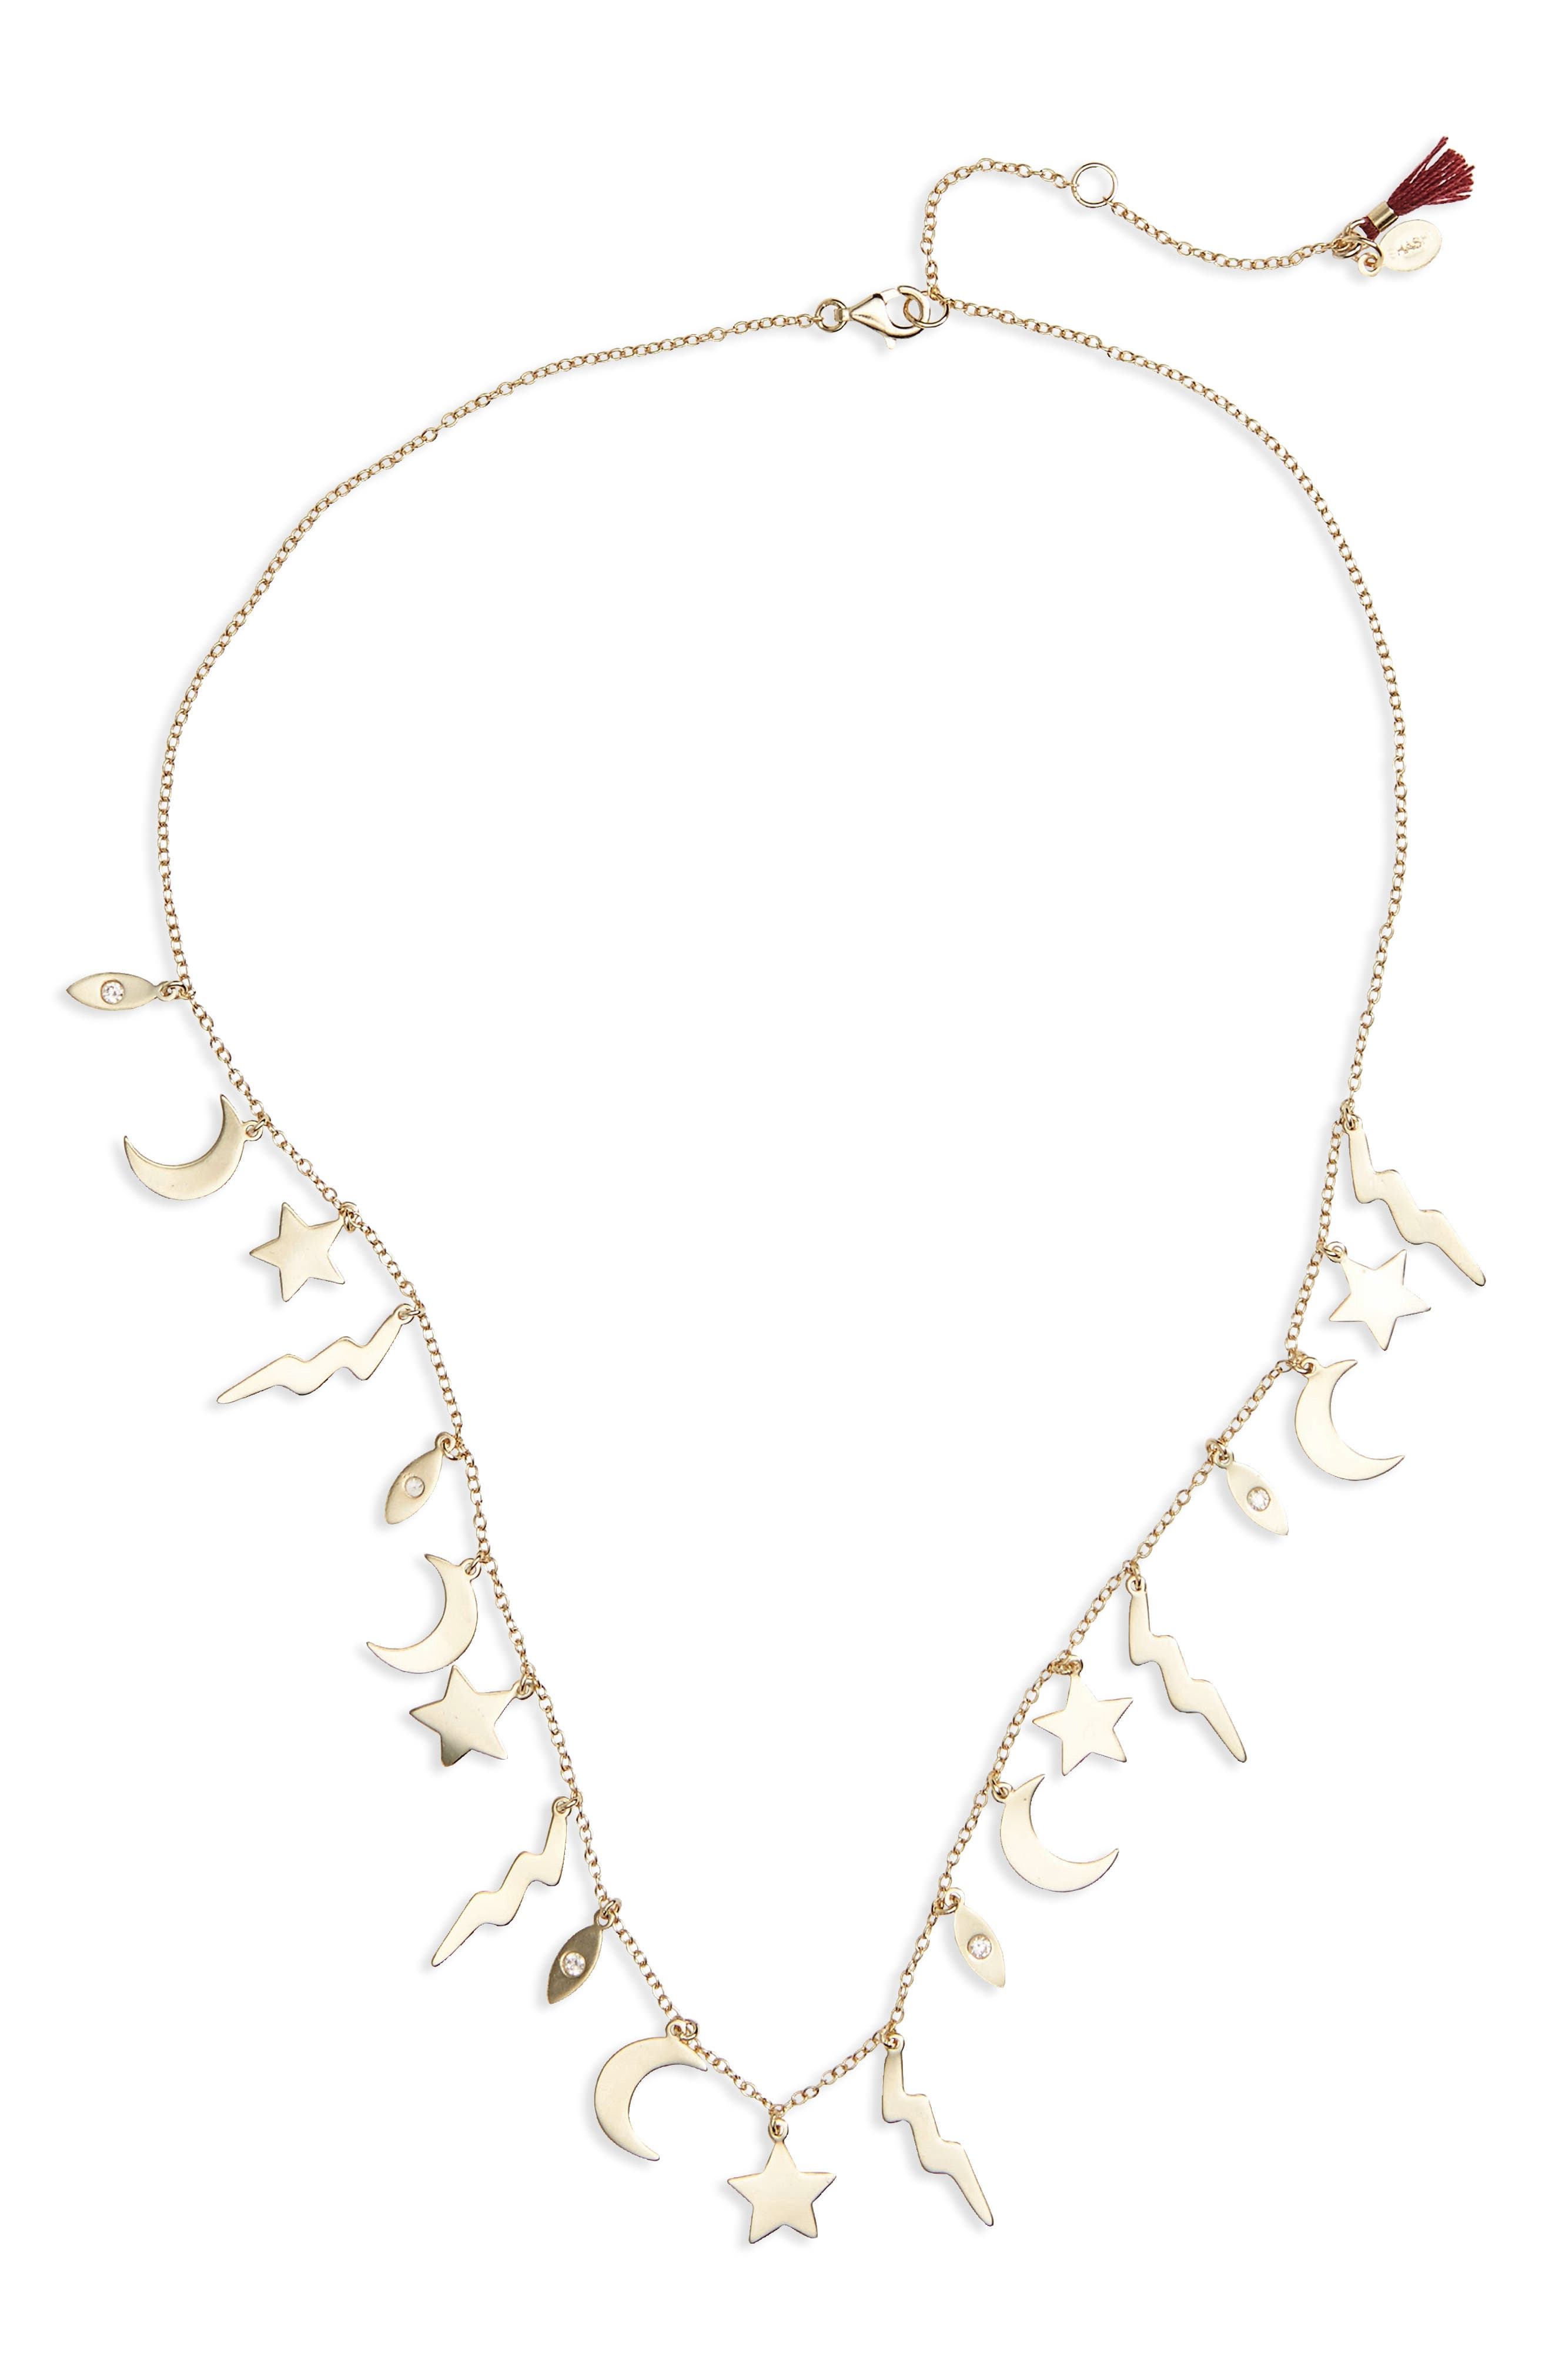 Multi Charm Necklace,                             Main thumbnail 1, color,                             700